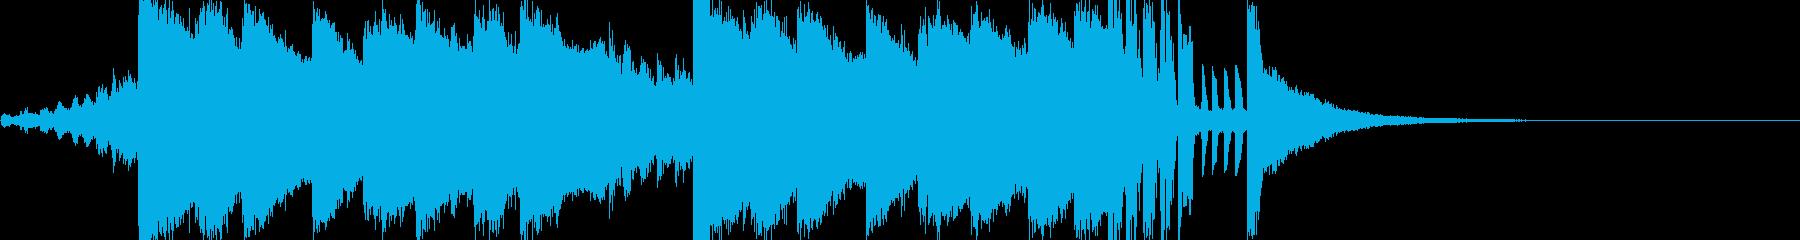 Trap+HipHop系 ジングル用の再生済みの波形